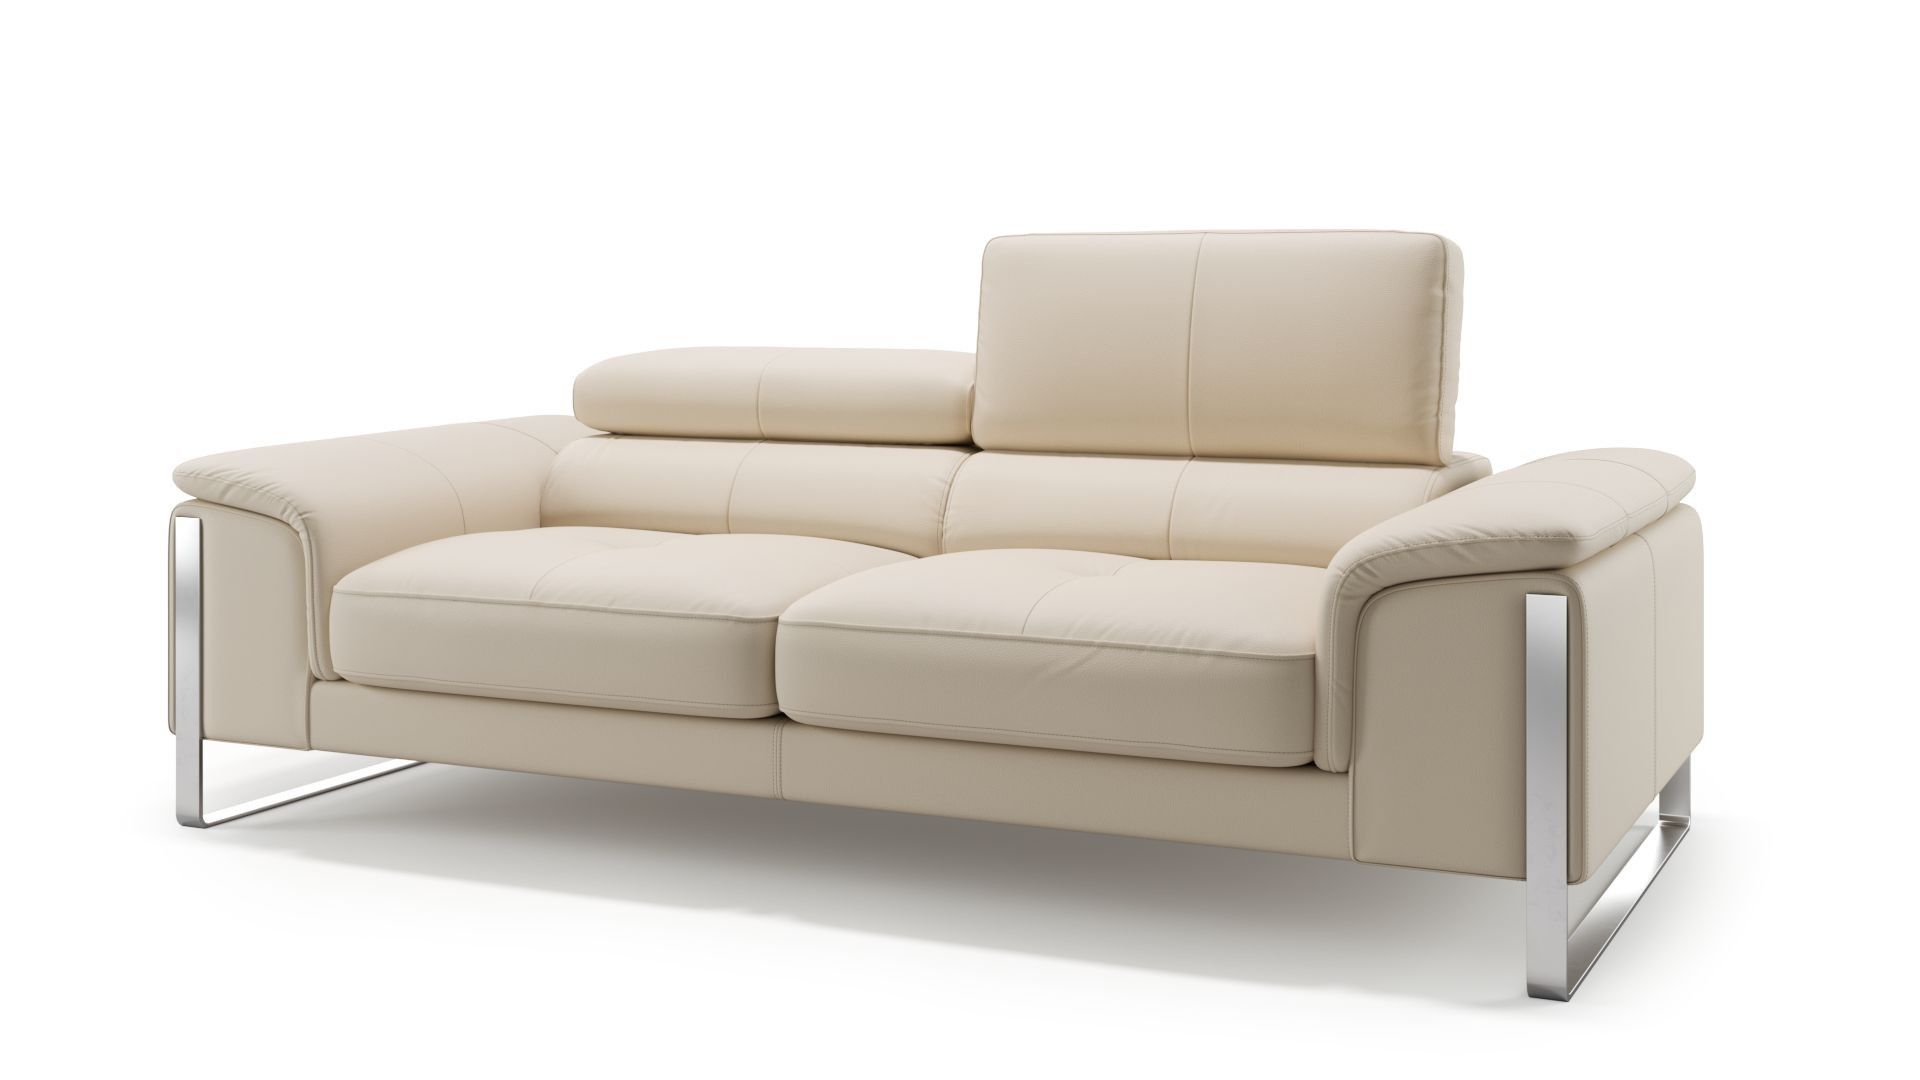 Sofa Material Inspirational Leder 3 Sitzer Pizolli Mit Individuellem Kopfteil